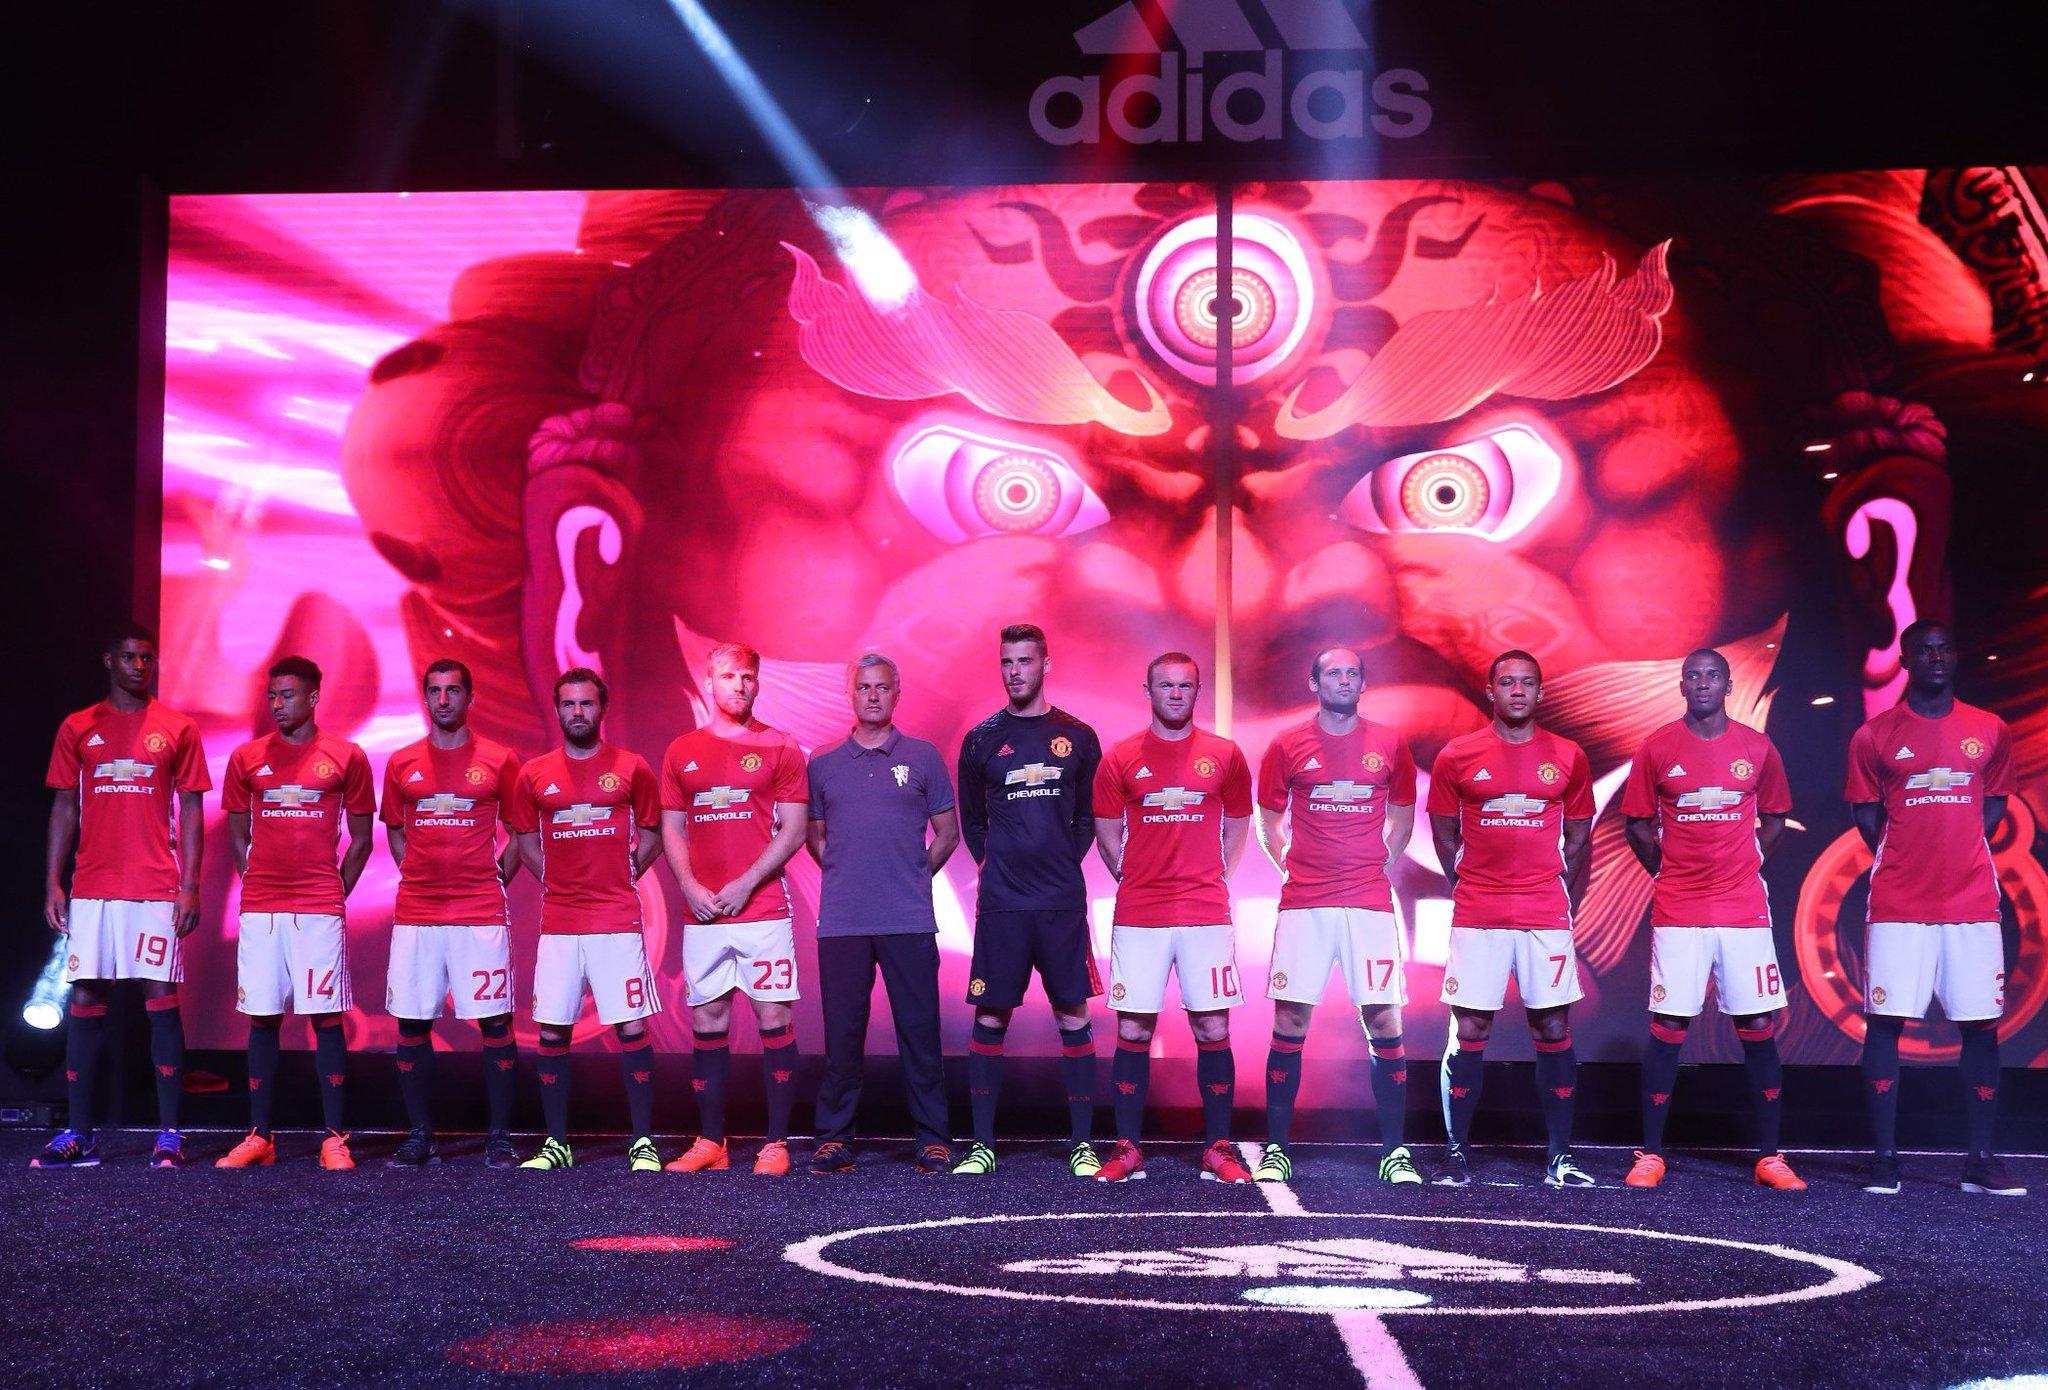 Hilo del Manchester United CoCAHIVXYAAMmTu